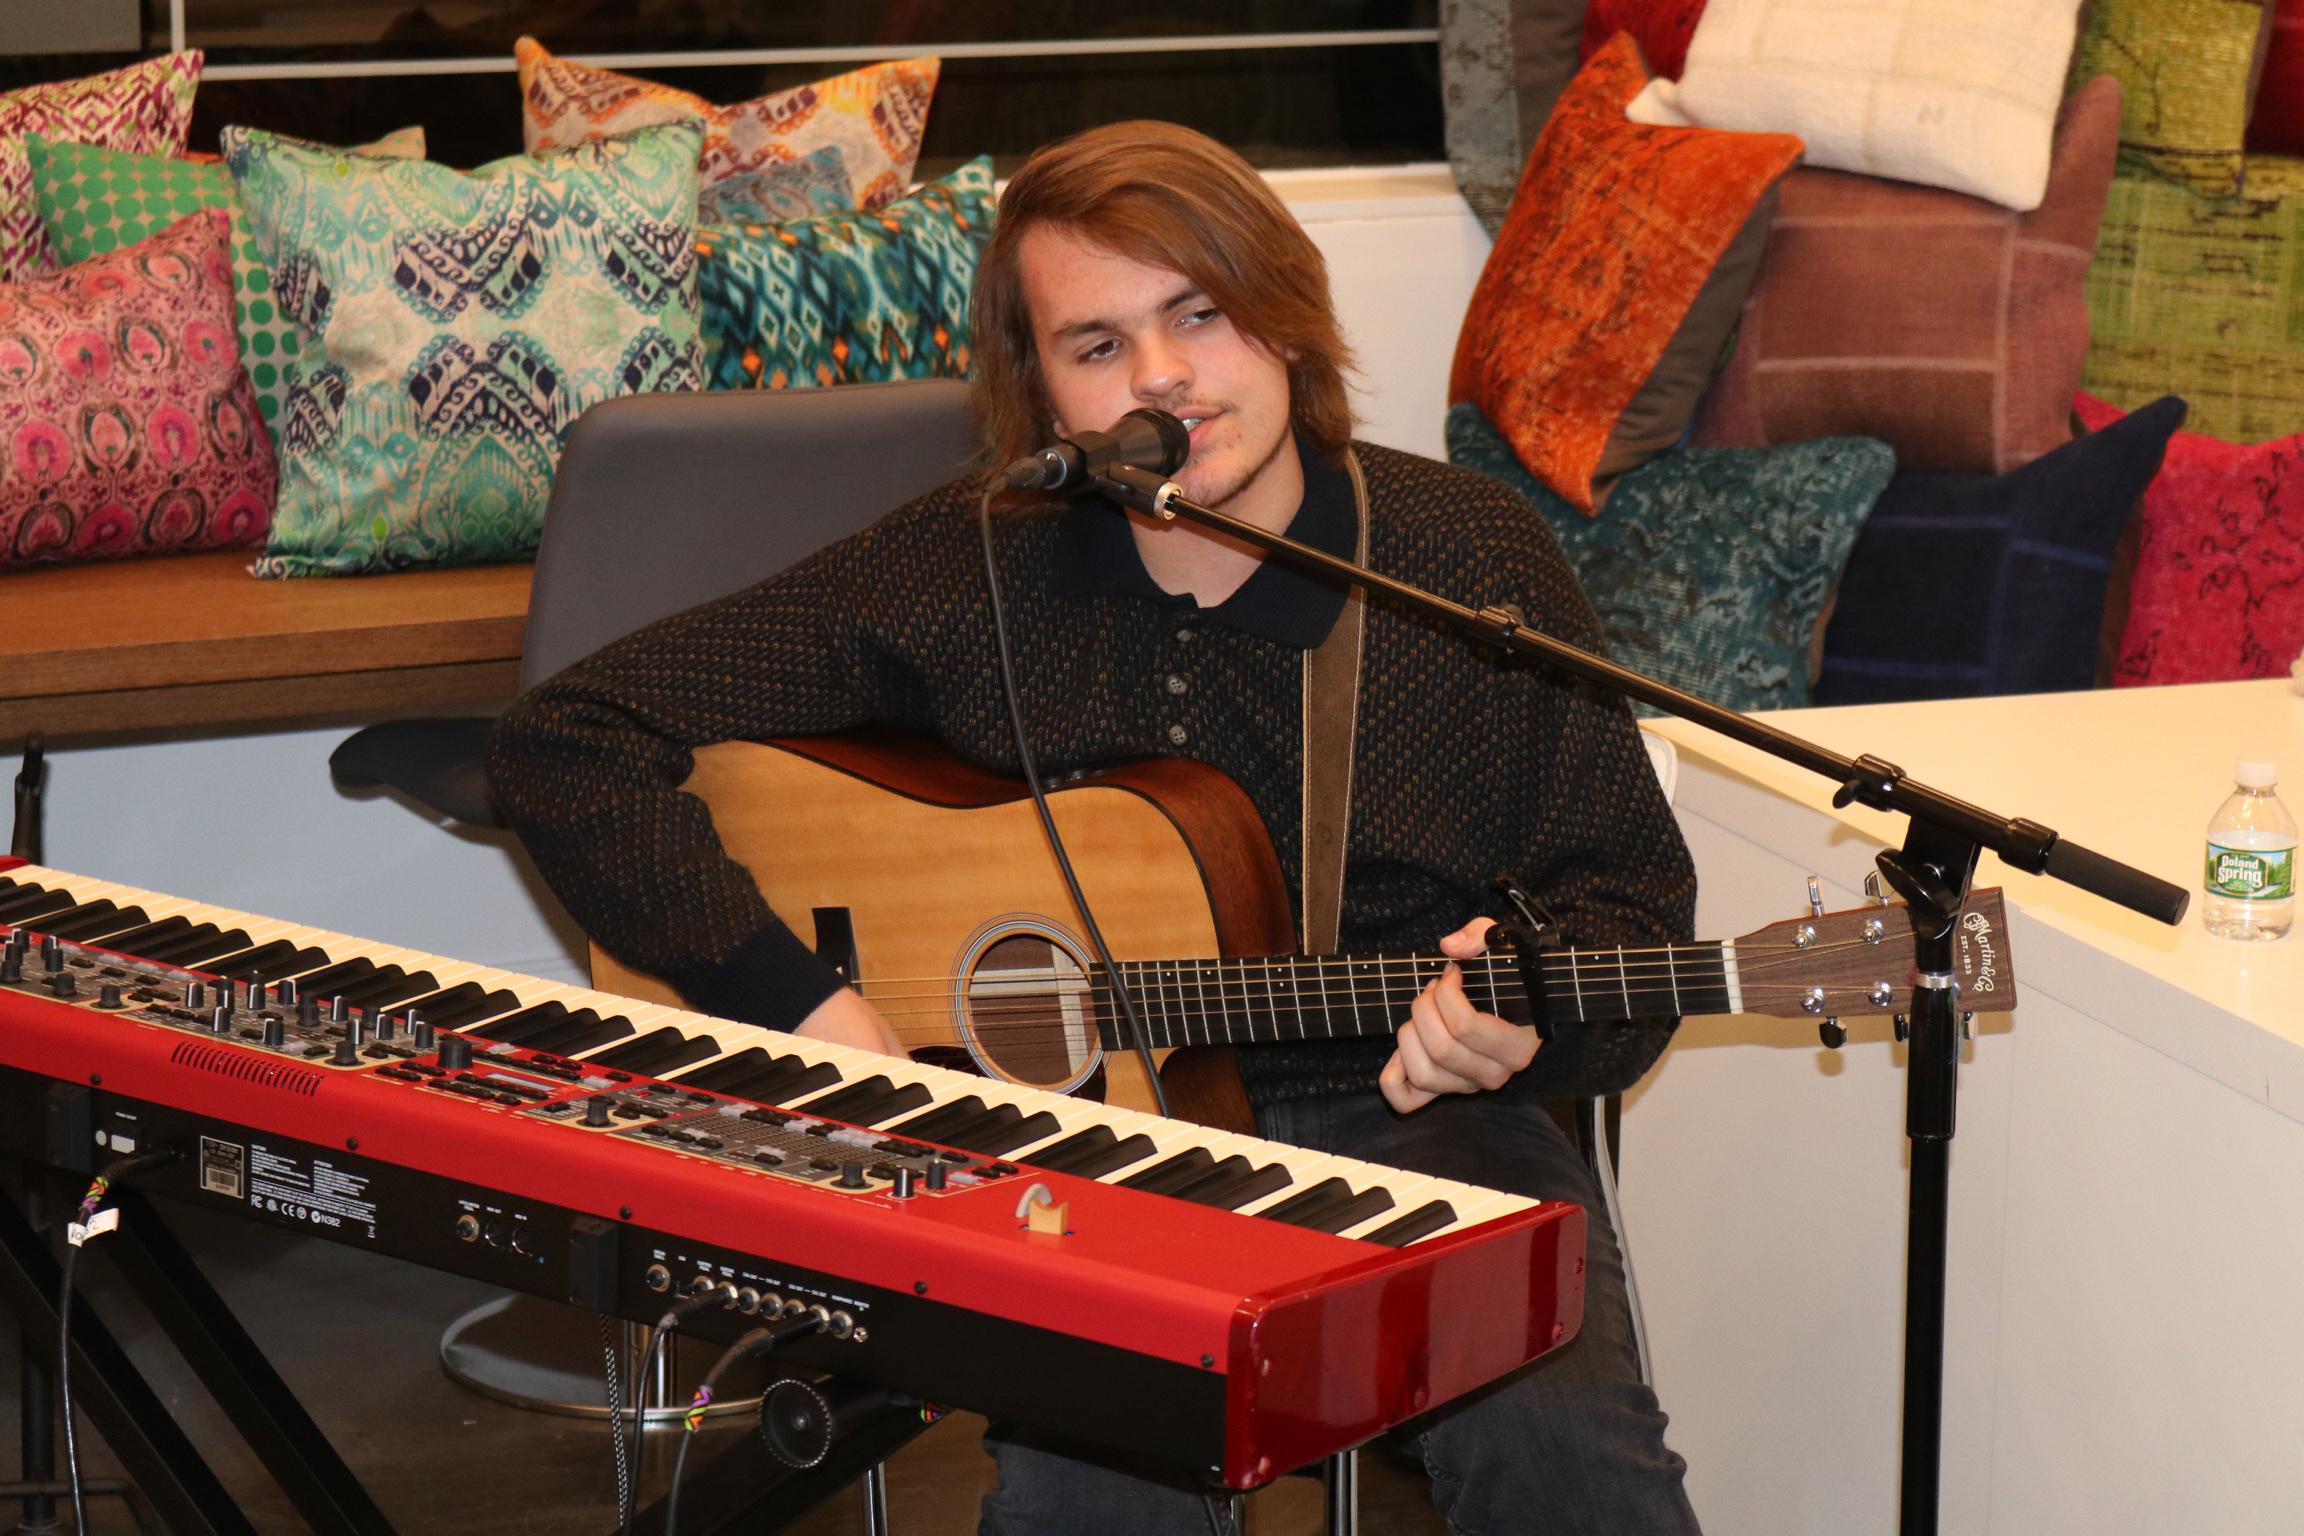 Musical performance at RBDC 12/7/17